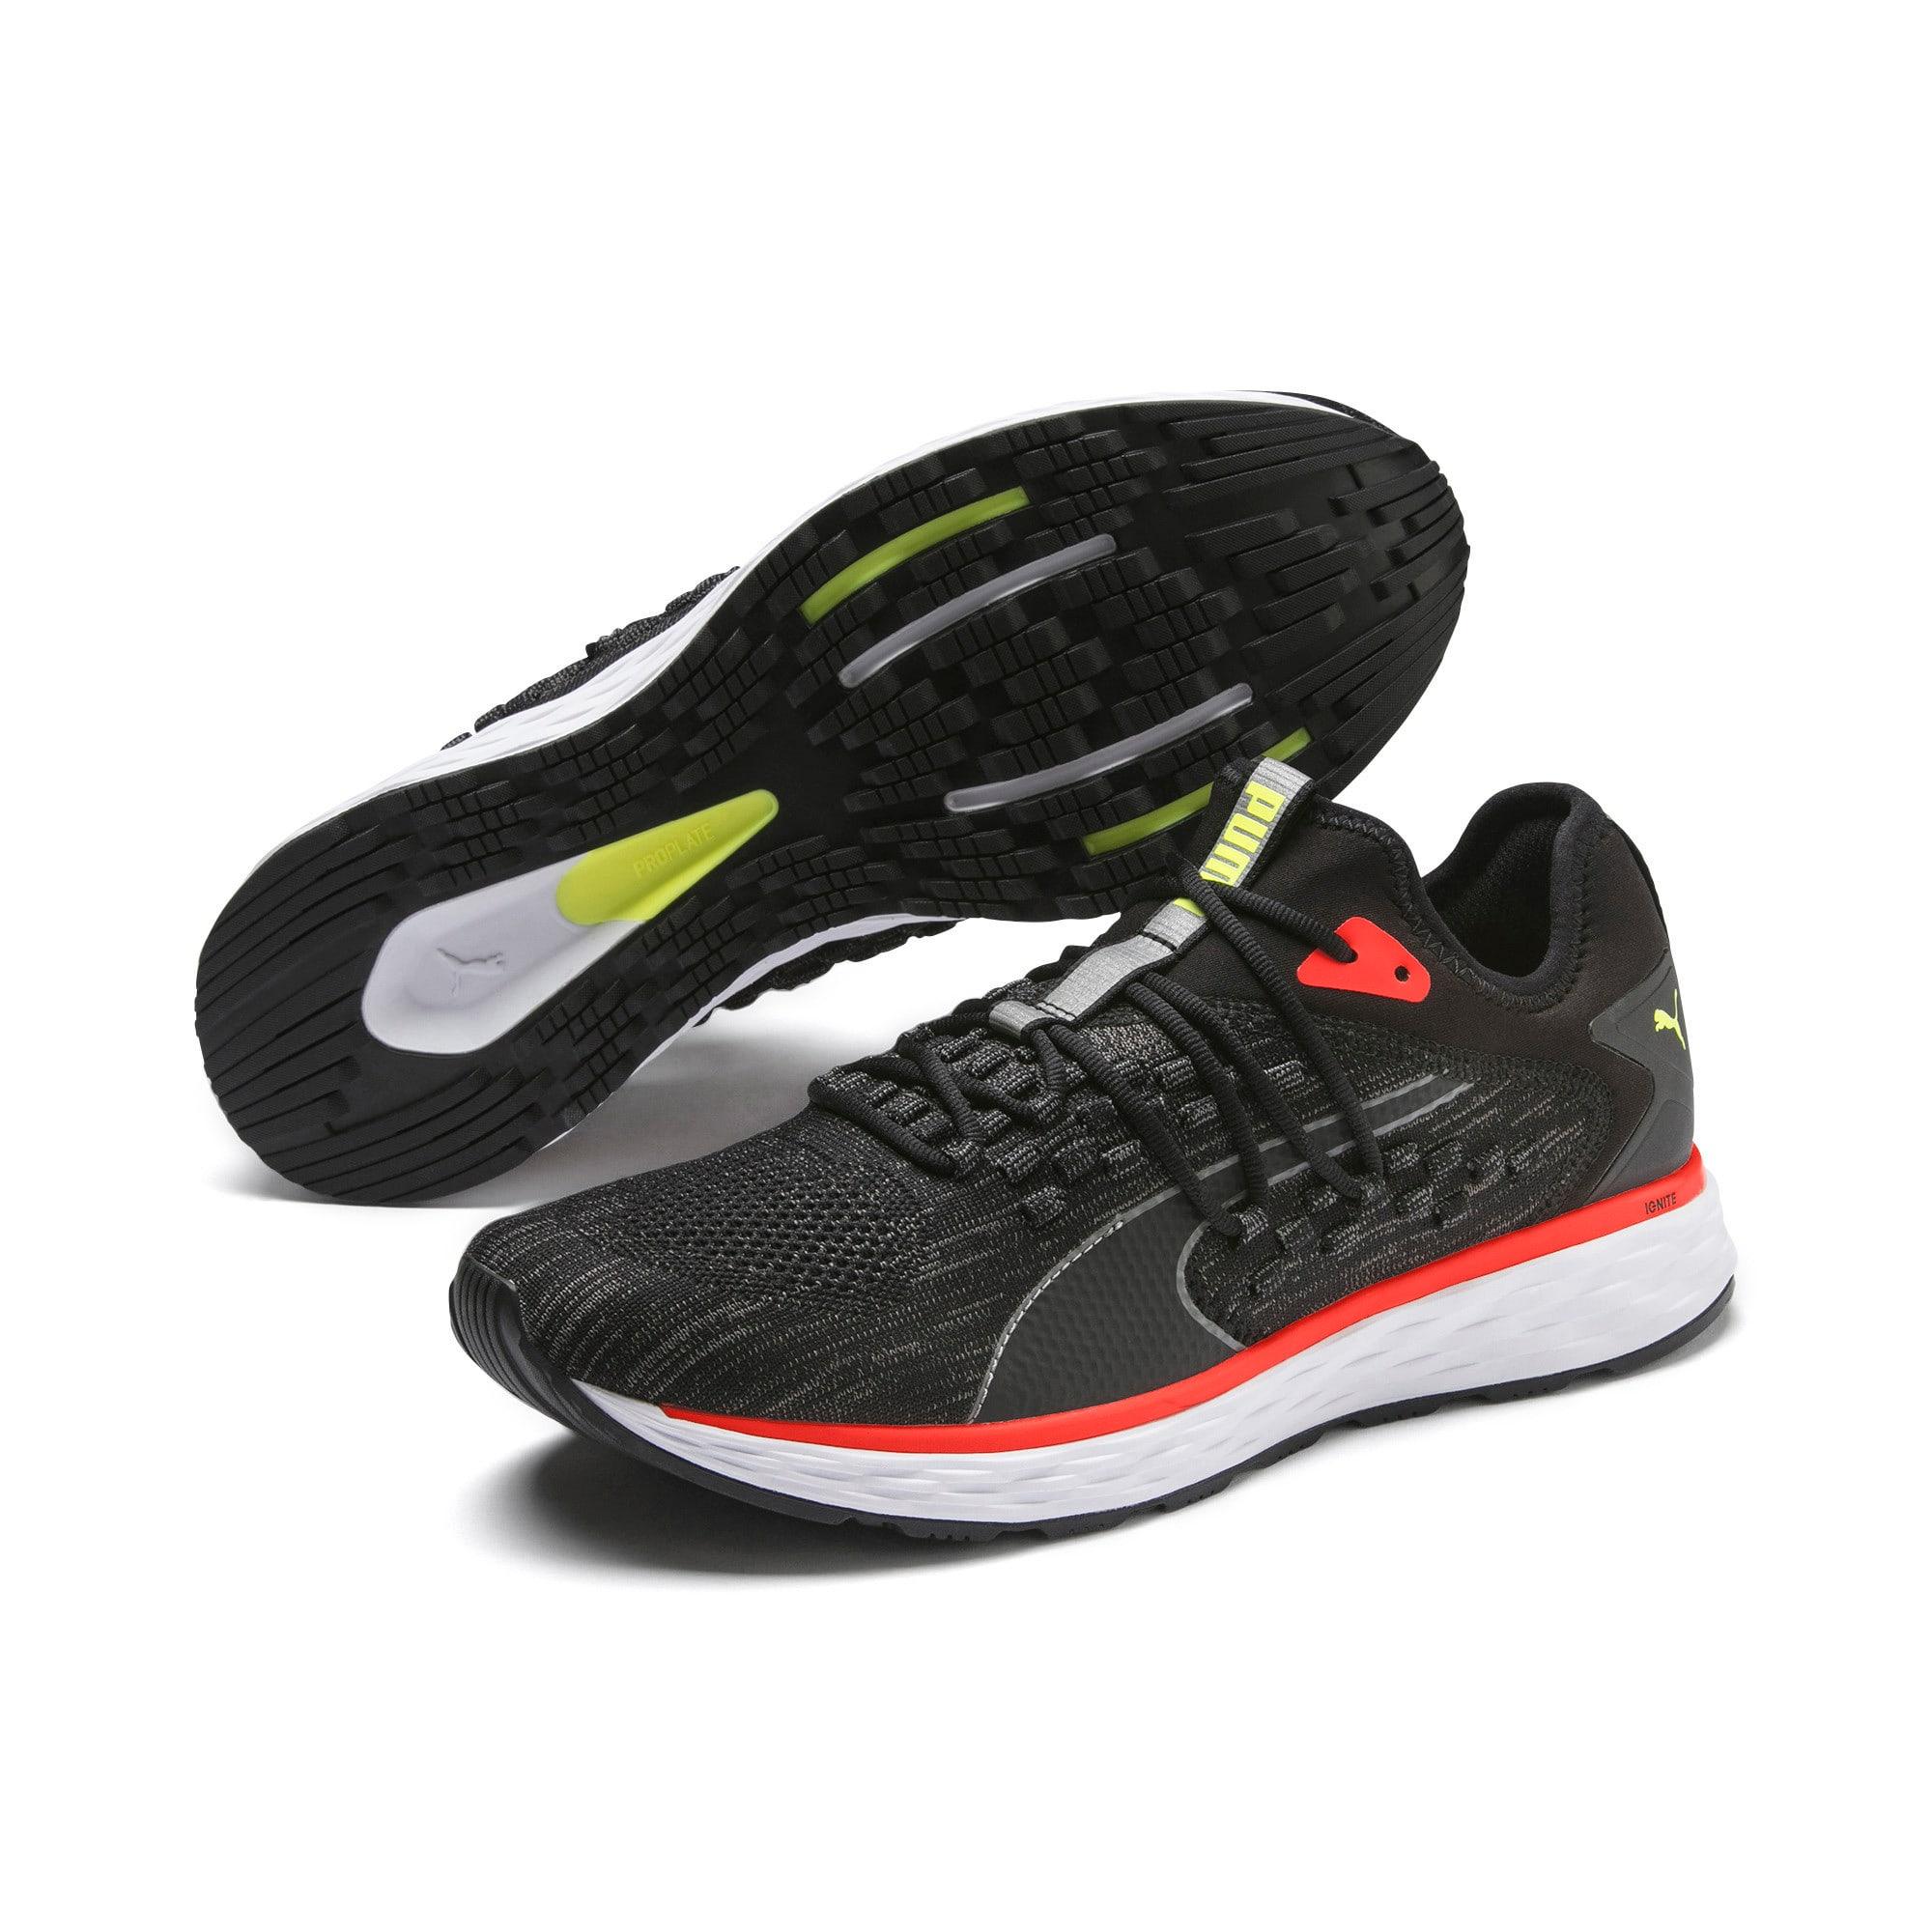 Thumbnail 3 of SPEED FUSEFIT Men's Running Shoes, Puma Black-Nrgy Red, medium